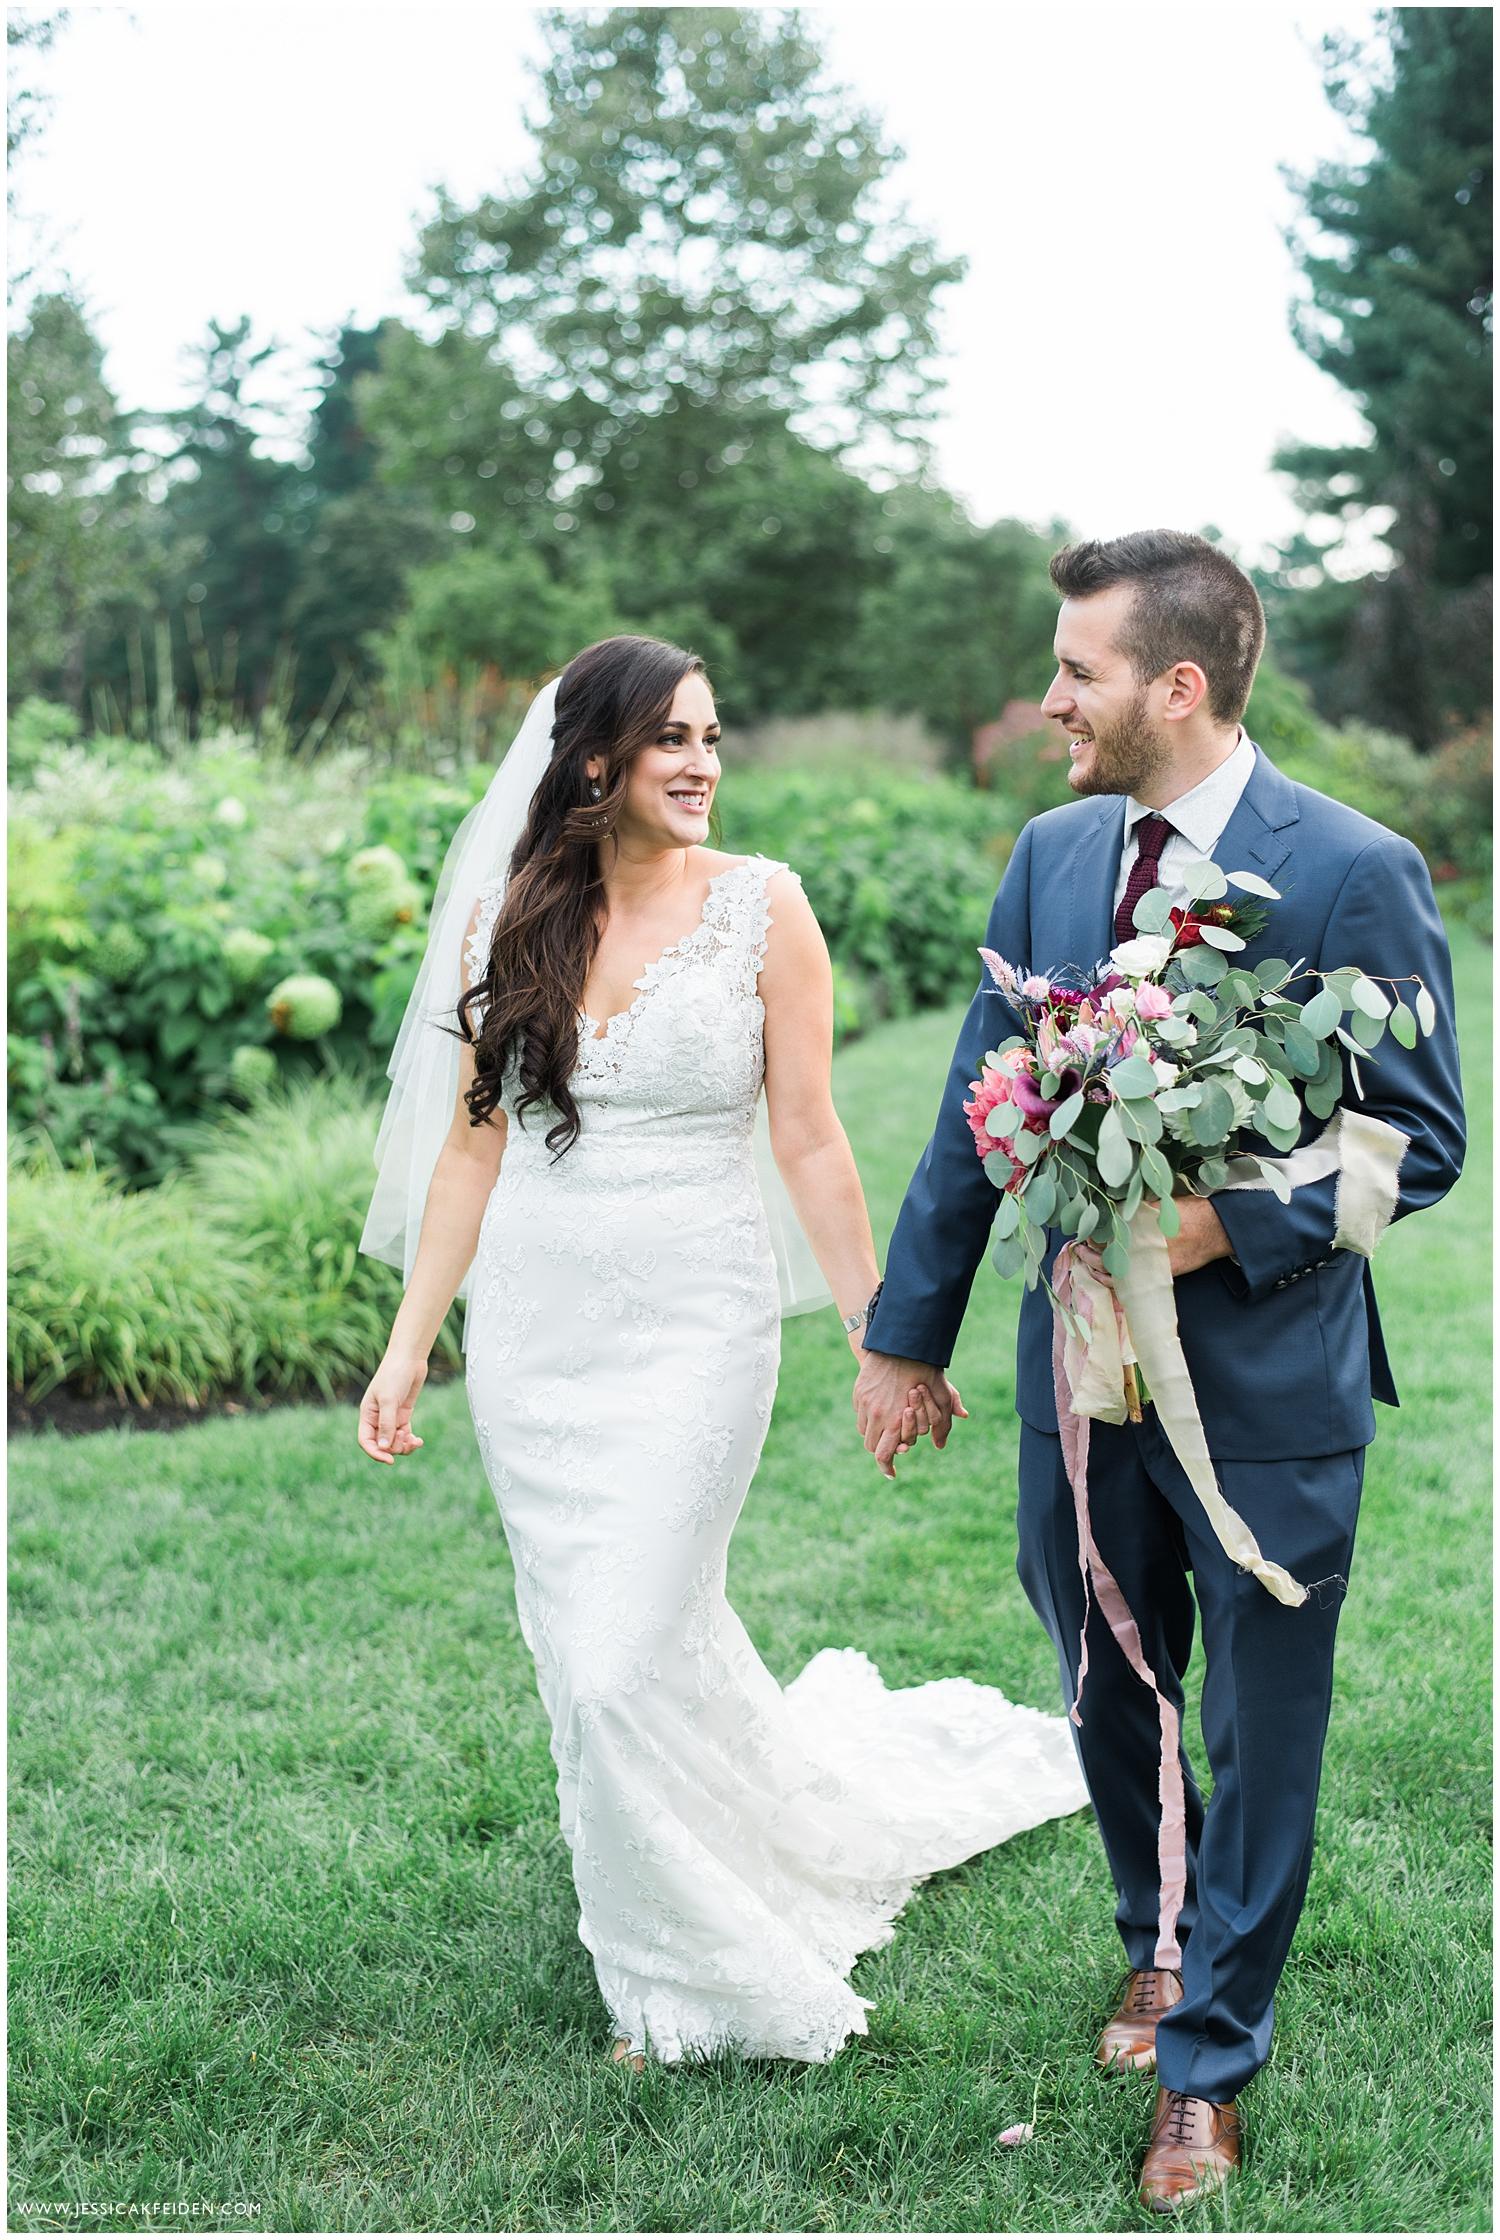 Jessica K Feiden Photography_Gardens at Elm Bank Wedding_0041.jpg